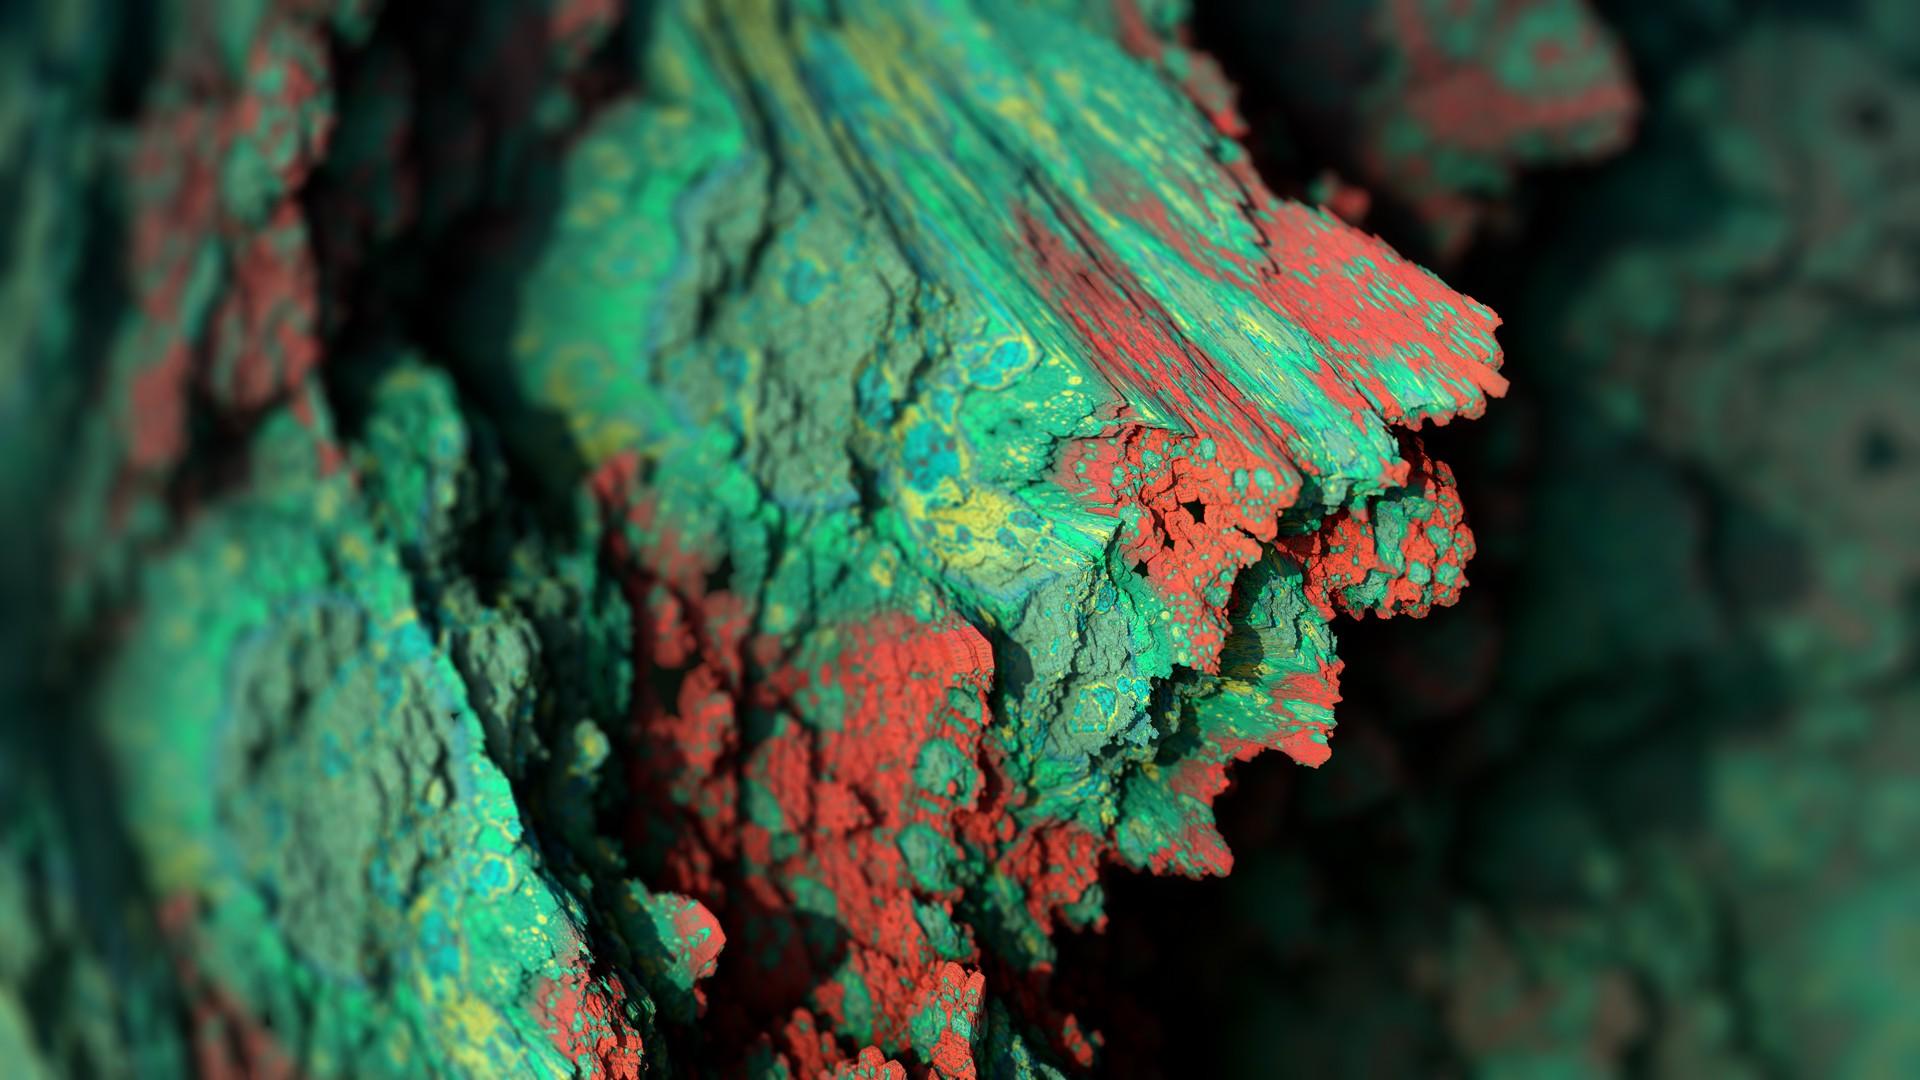 General 1920x1080 Procedural Minerals mineral abstract depth of field CGI artwork digital art